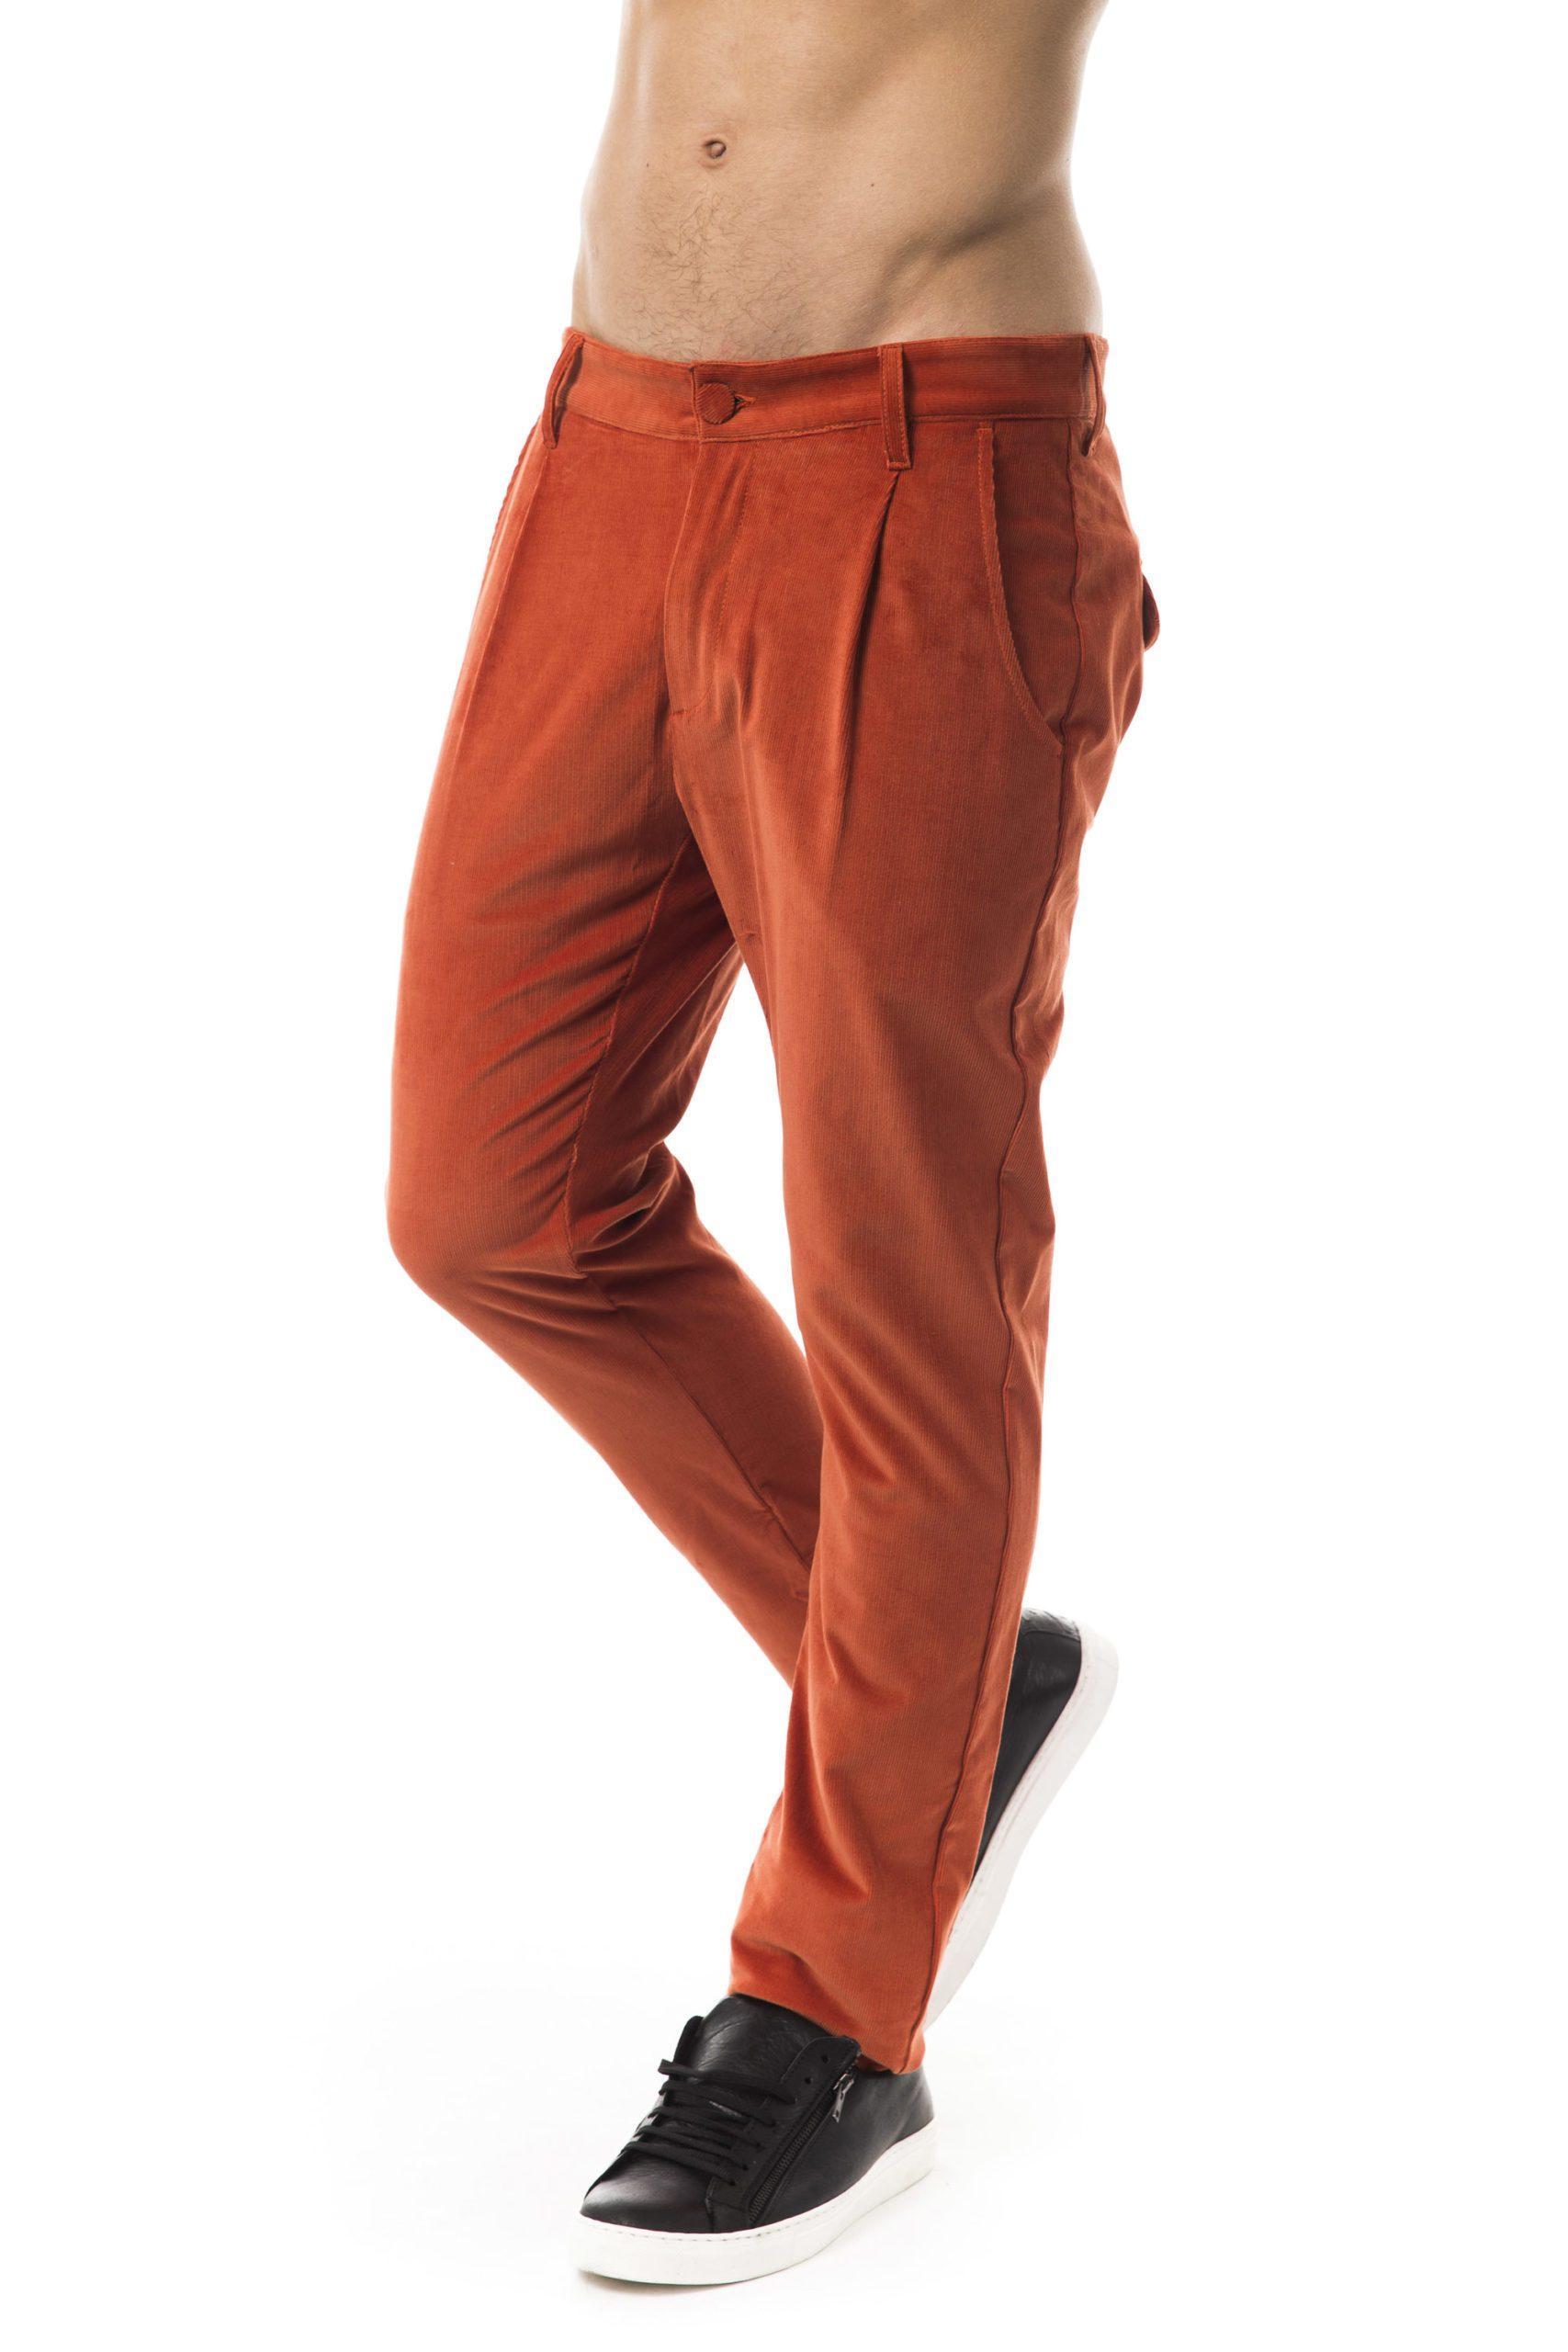 BYBLOS Men's Ruggine Trouser Orange BY1394824 - IT48 | M